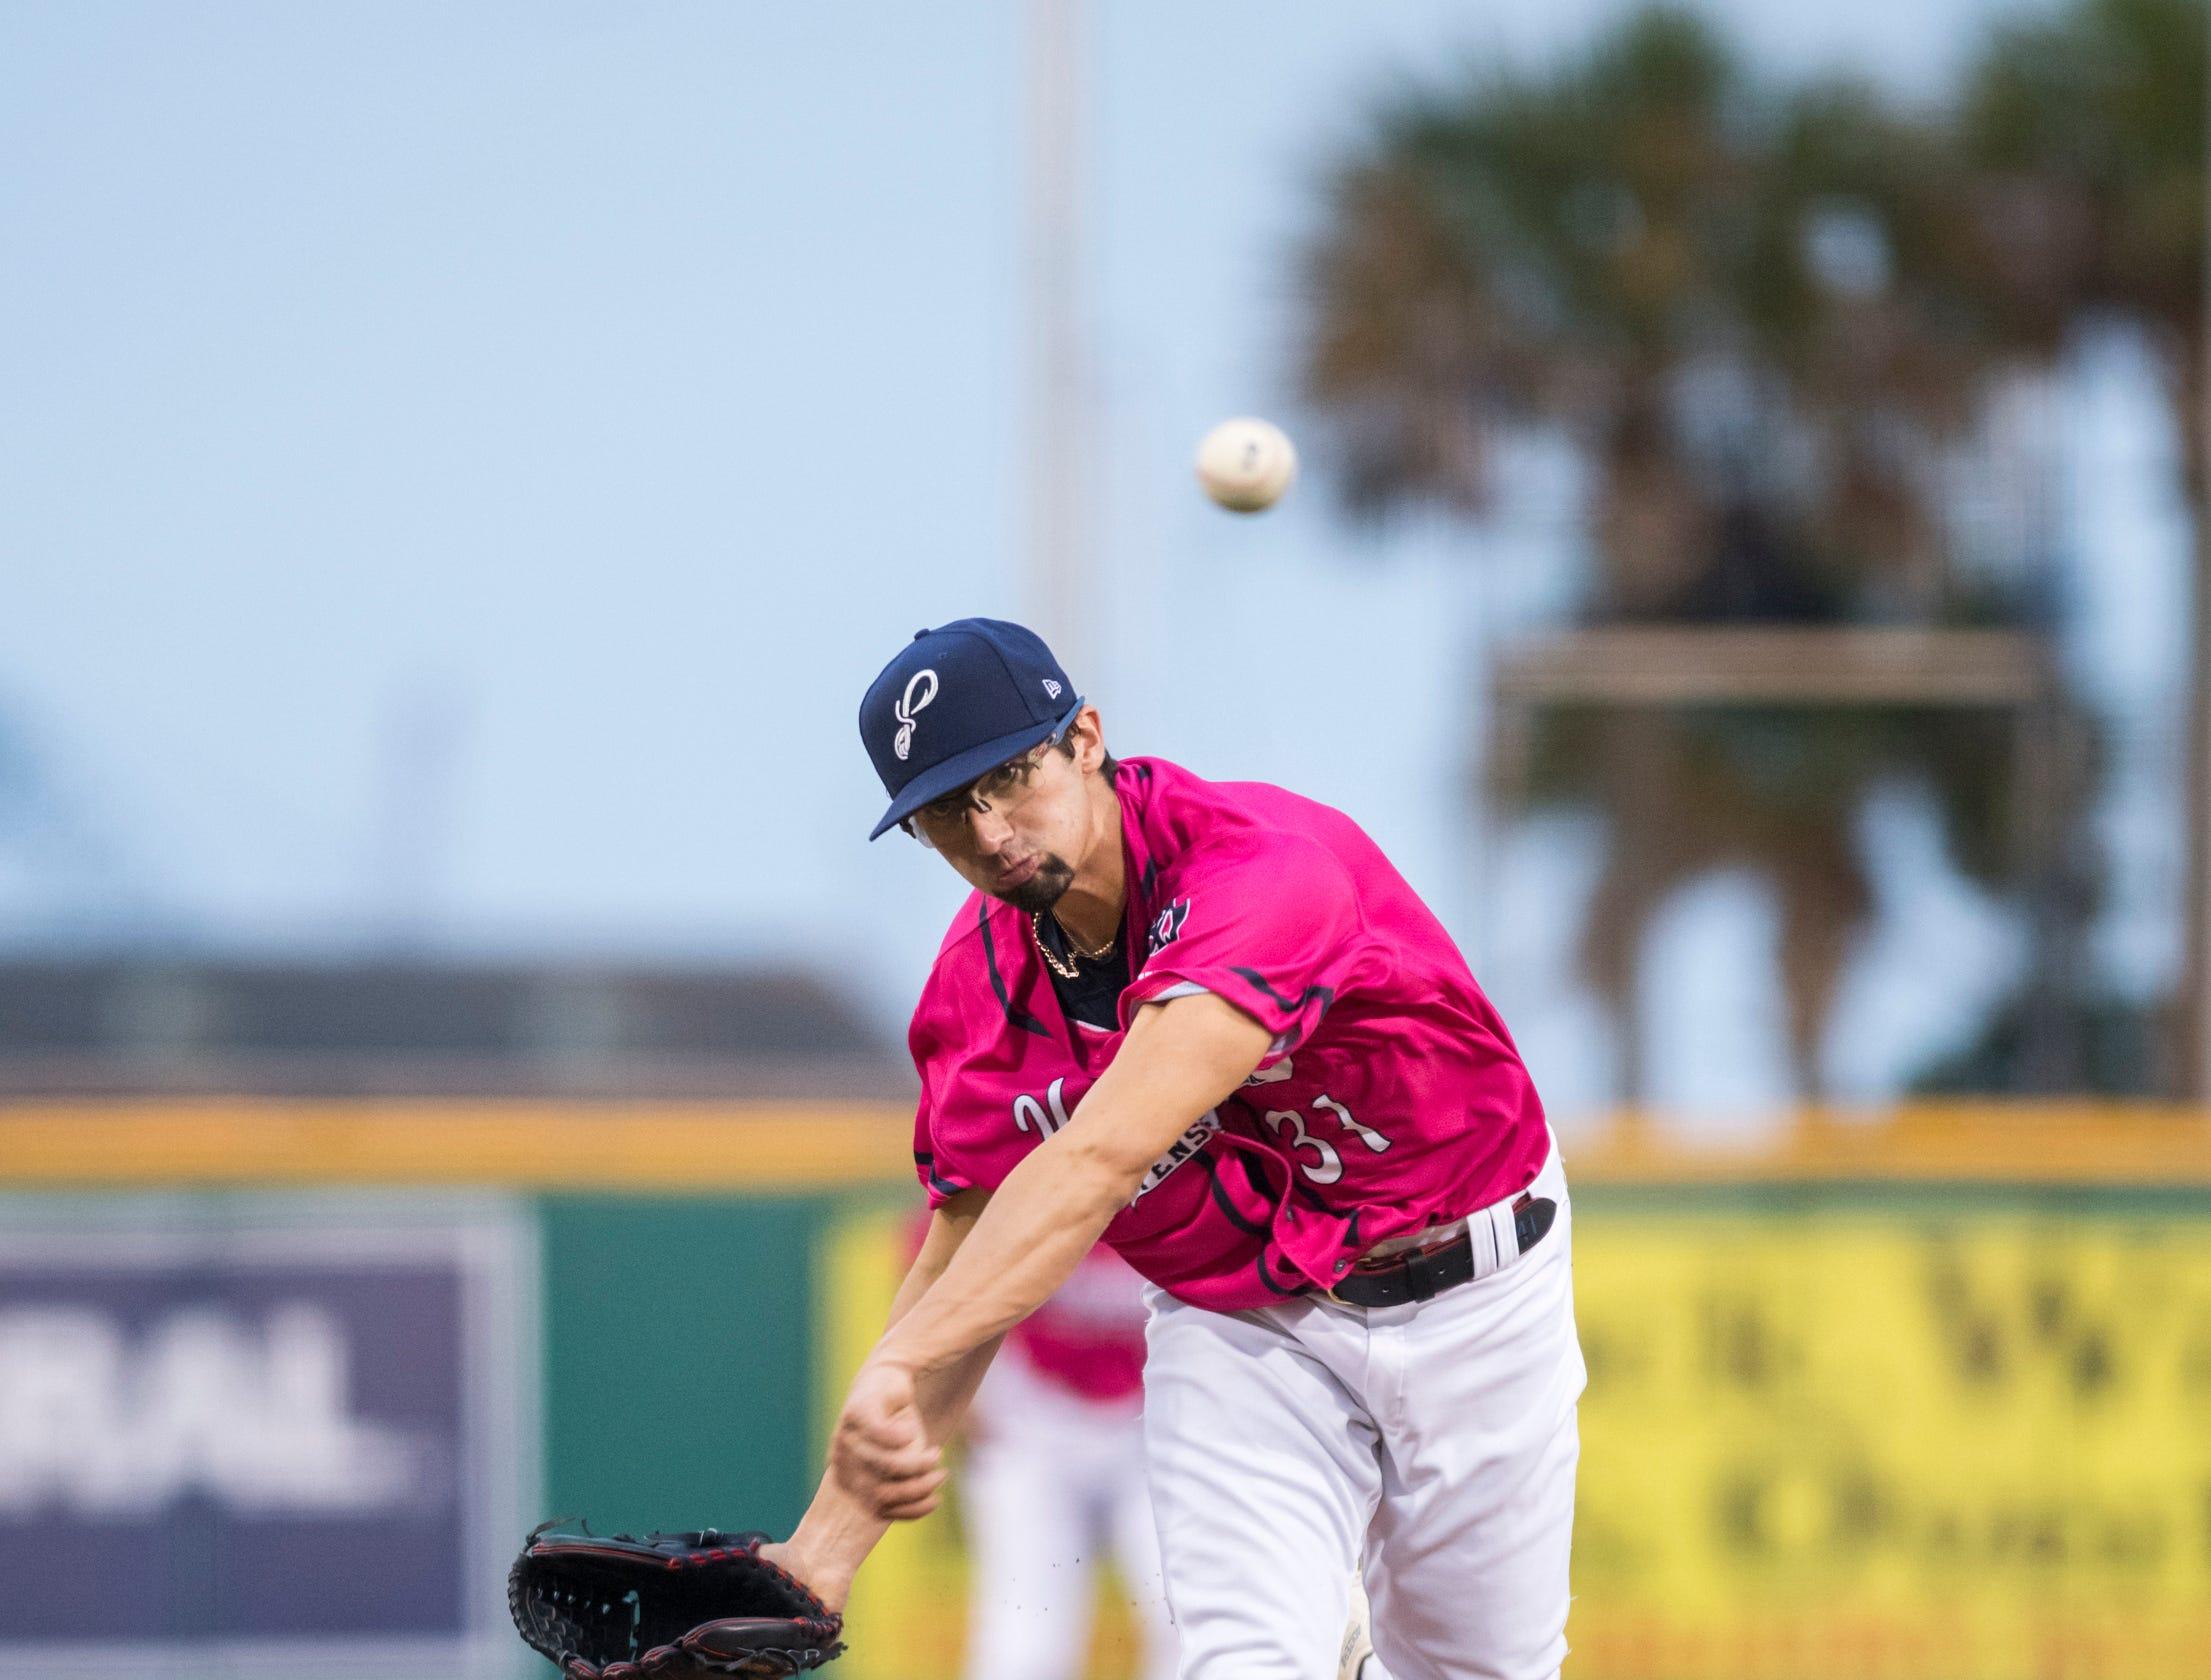 Devin Smeltzer (31) pitches during the Jacksonville Jumbo Shrimp vs Pensacola Blue Wahoos baseball game in Pensacola on Friday, April 12, 2019.